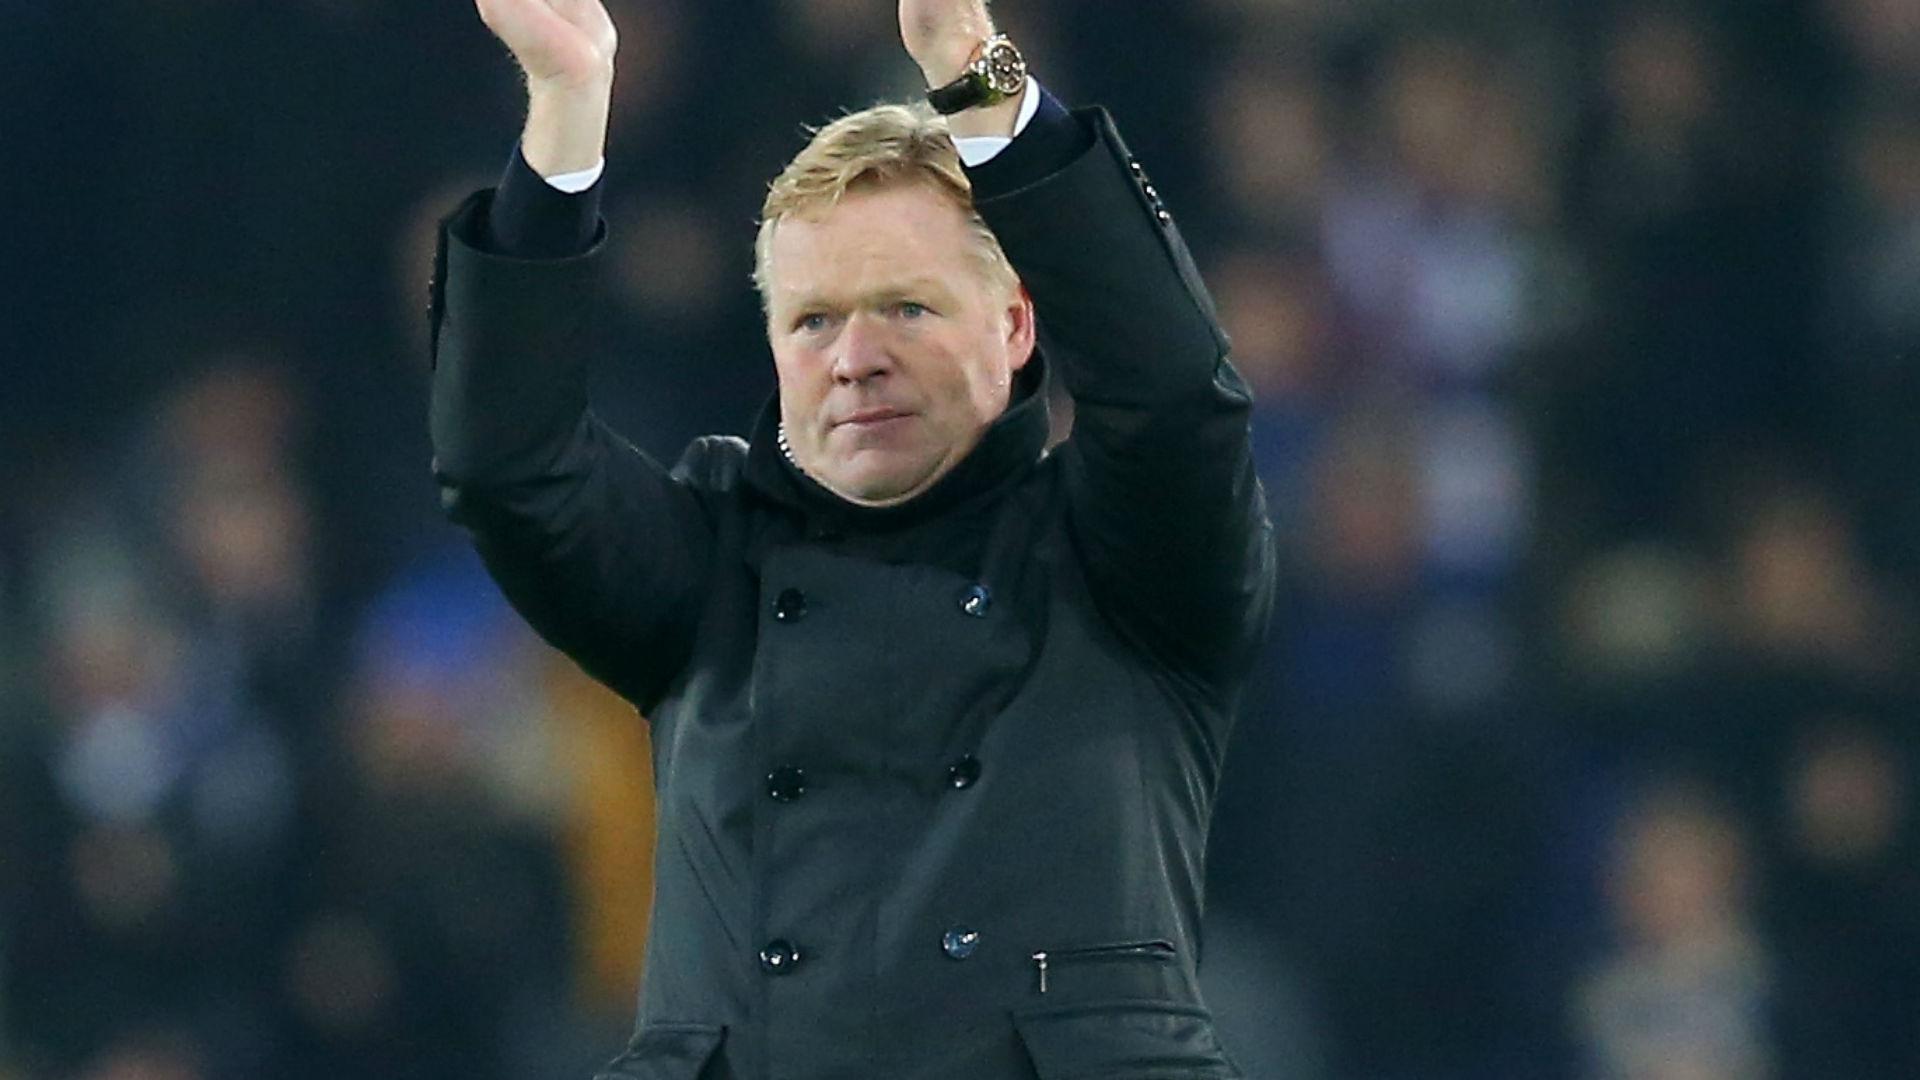 Liverpool need no extra motivation against everton says klopp